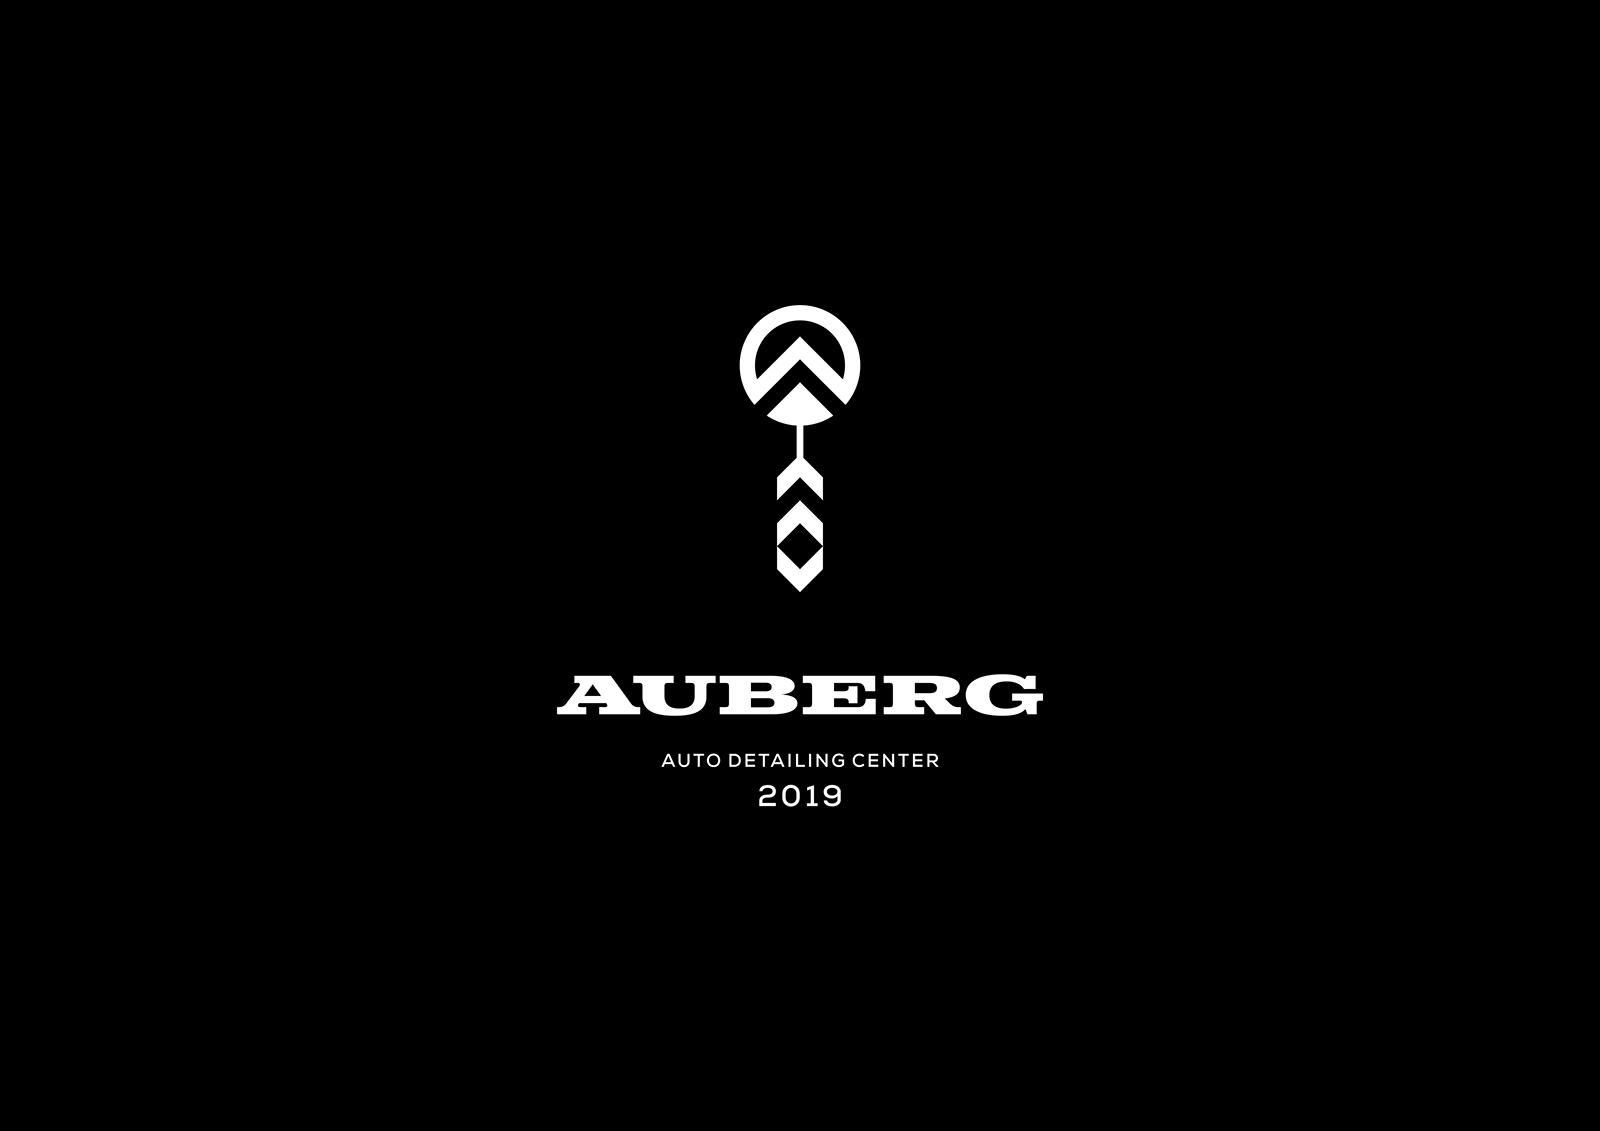 логотип и фирменный стиль, детейлинг-центр Auberg